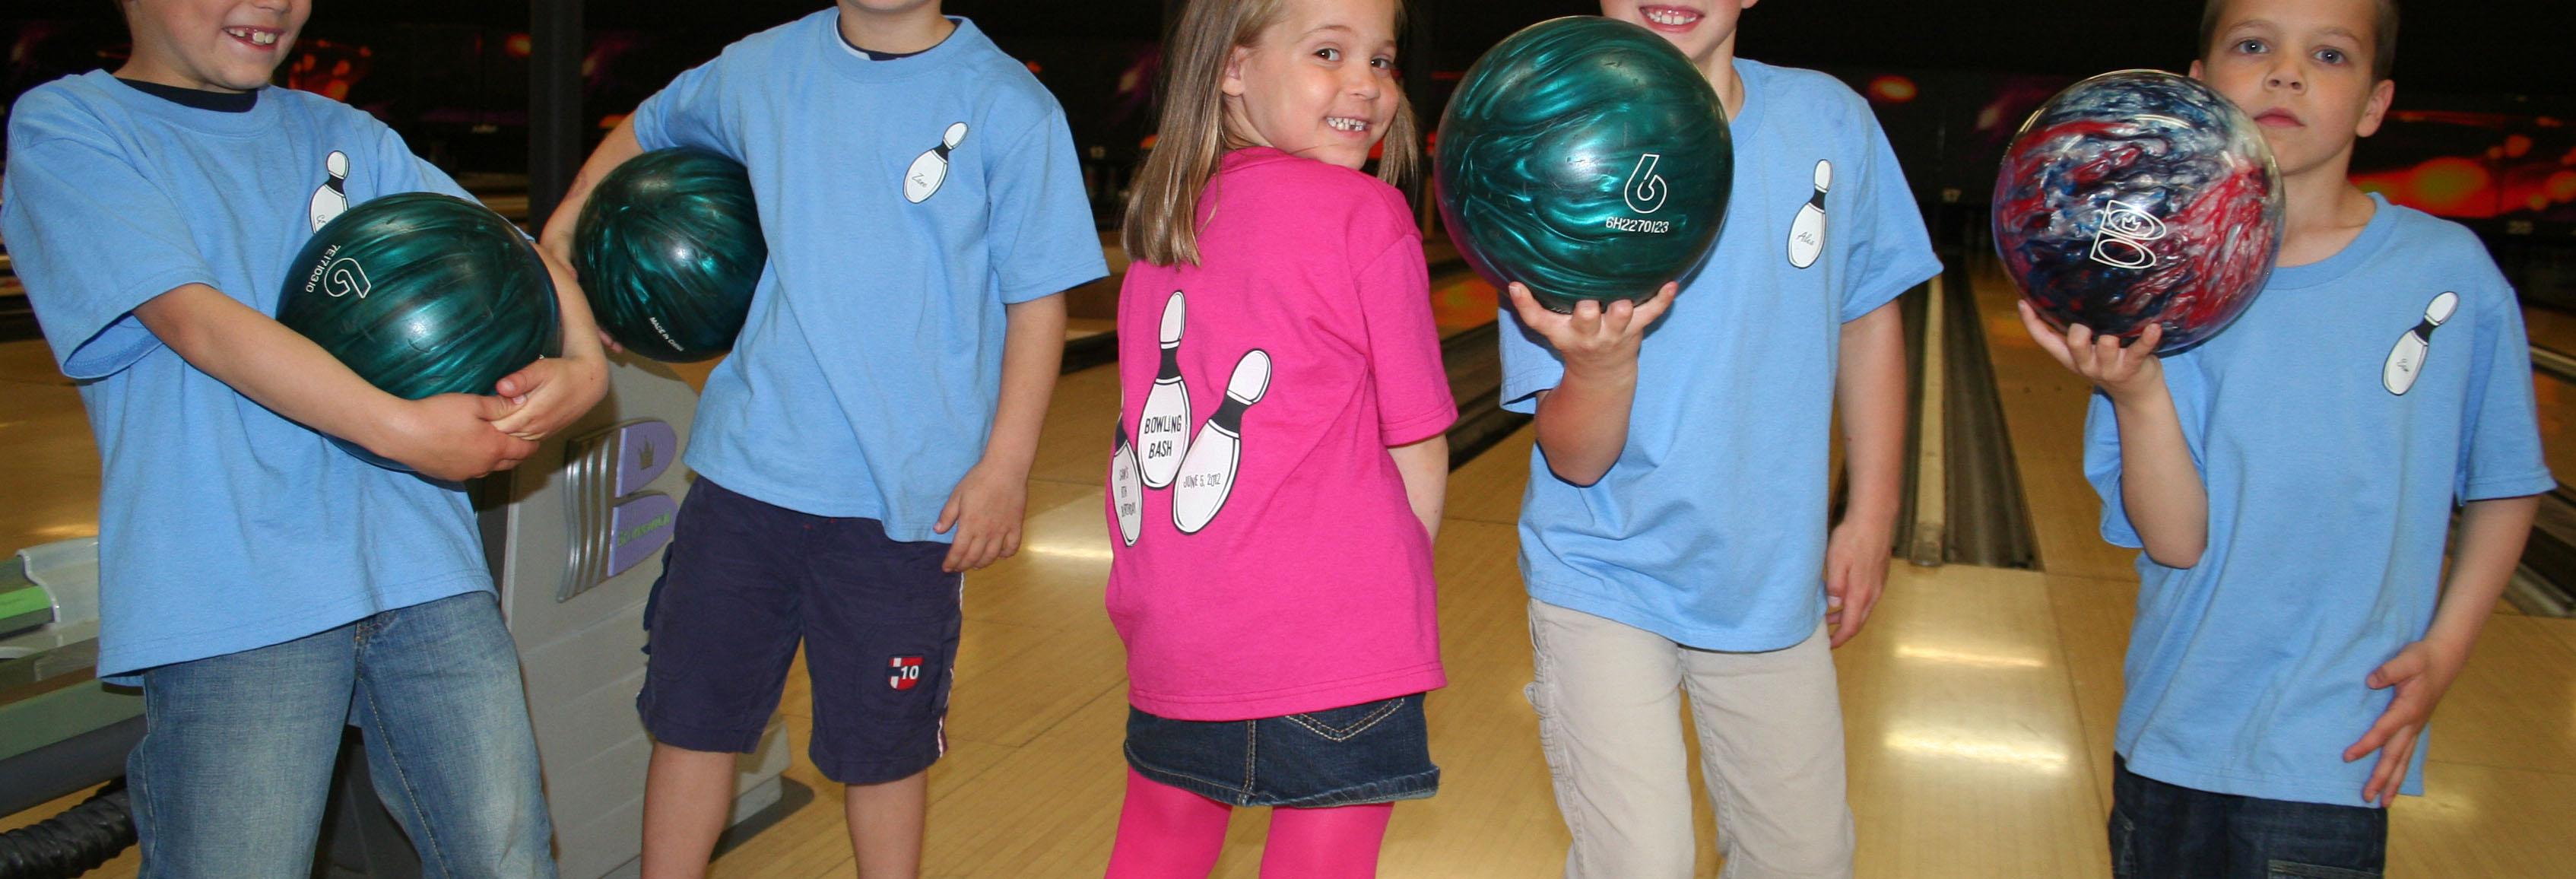 Kids Bowling Party